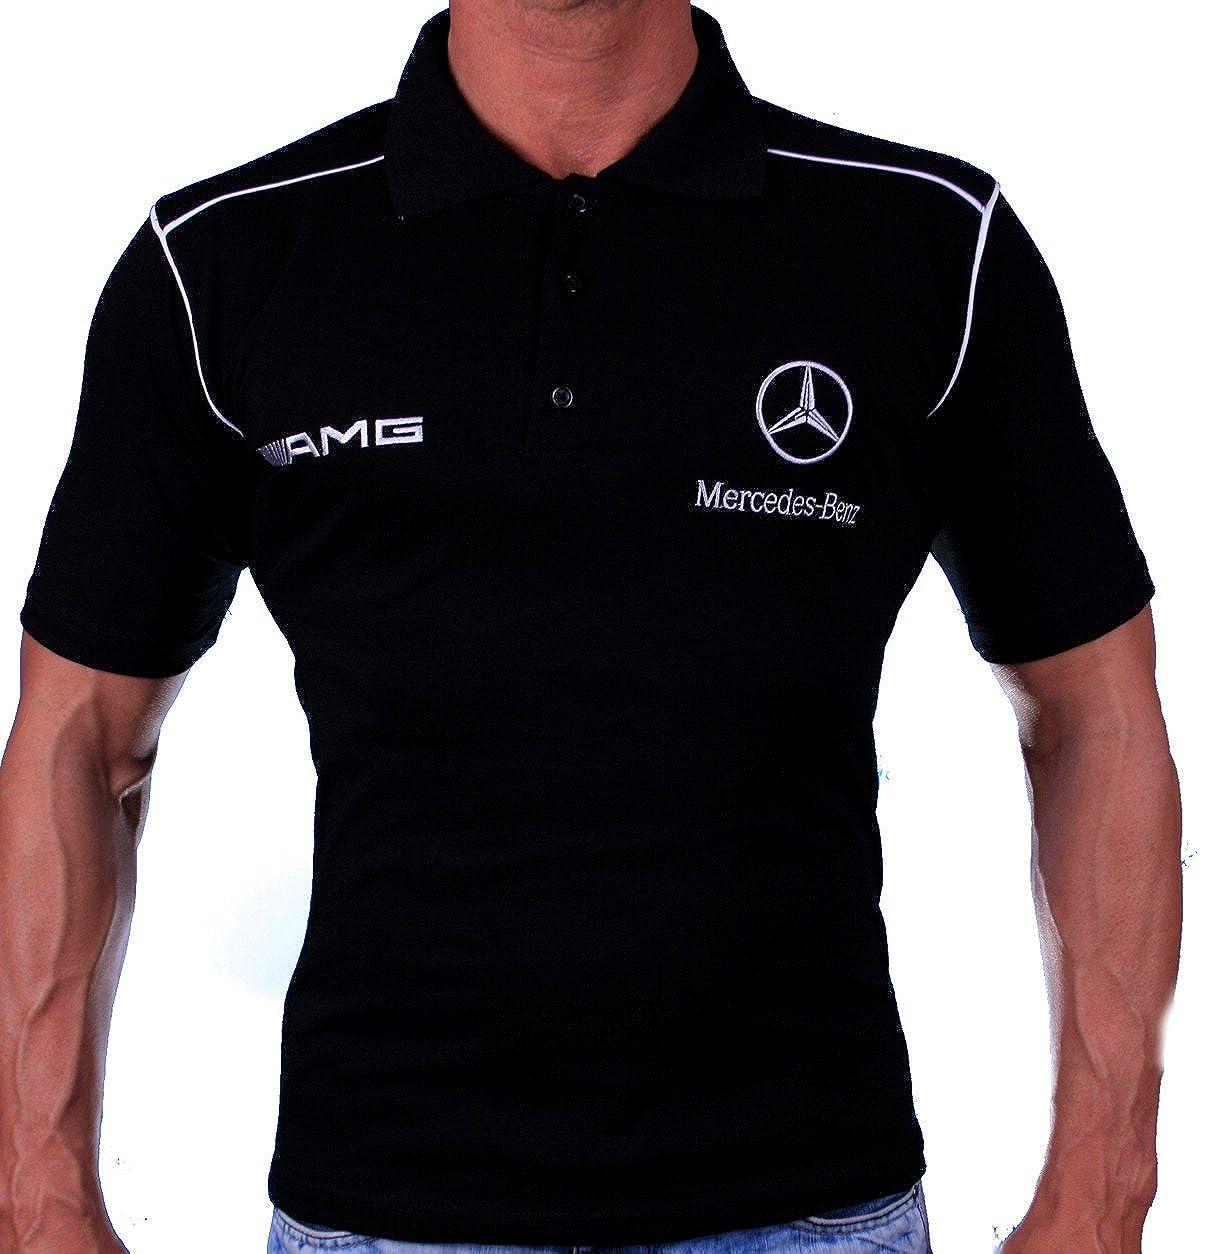 Mercedes Benz AMG POLO T-shirt for women. genuine black